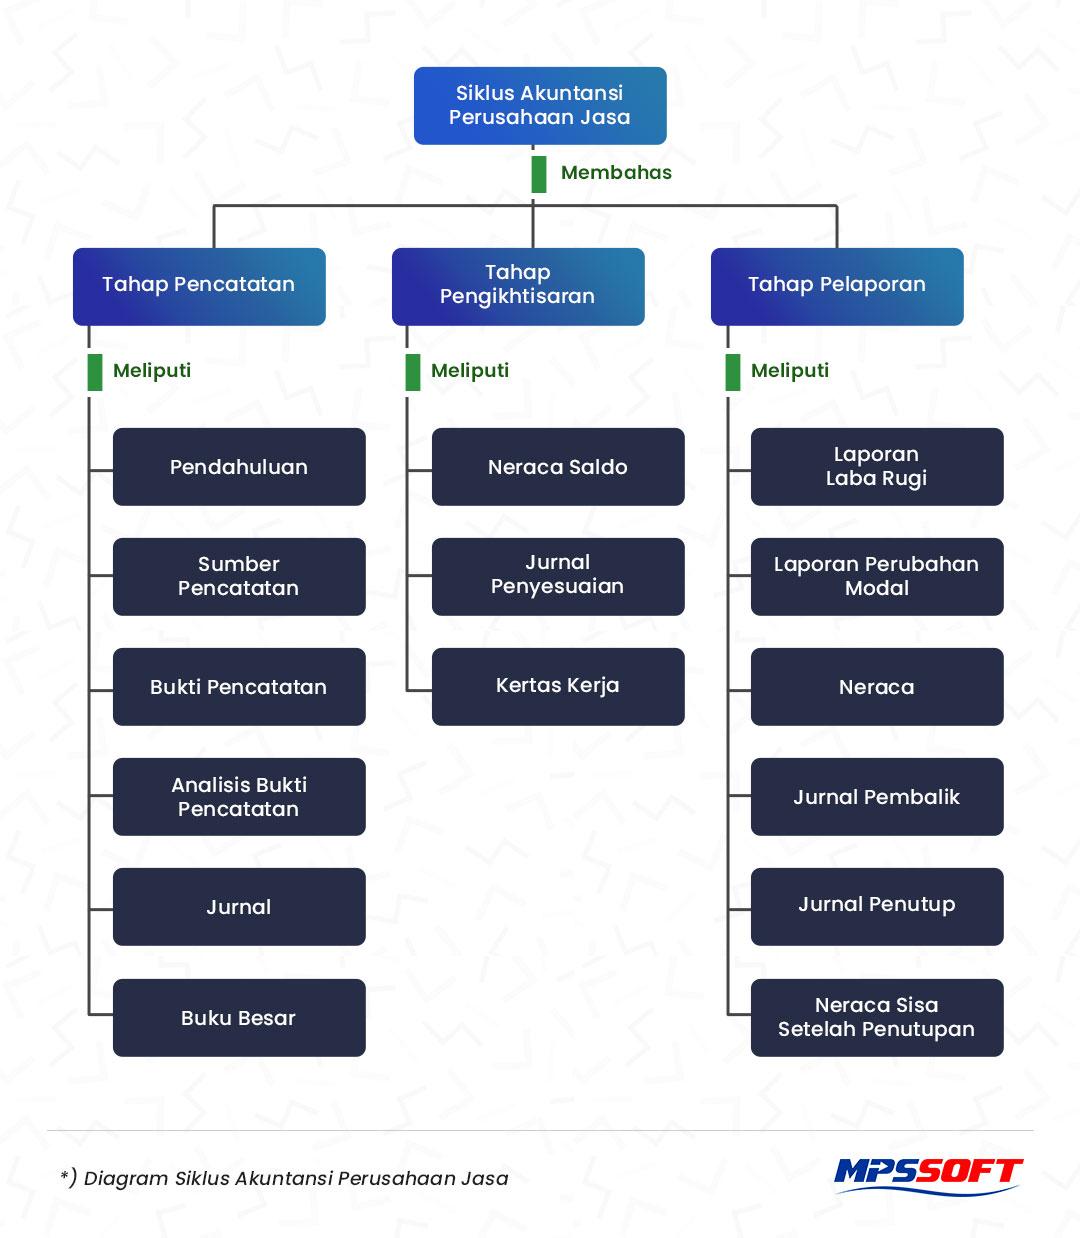 Diagram - Siklus Akuntansi Perusahaan Jasa